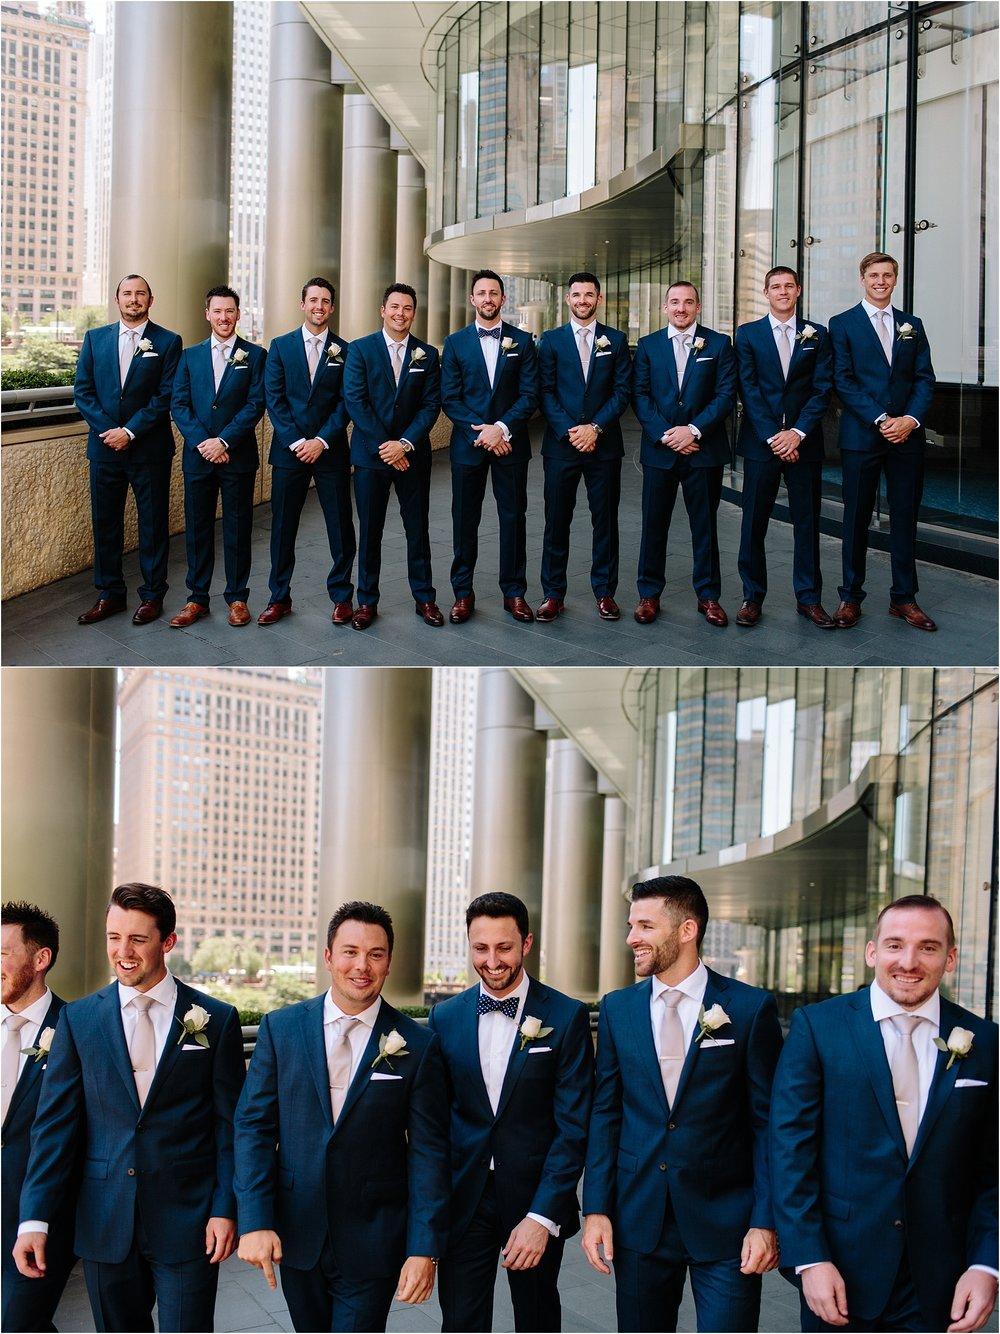 chicago-wedding-photographer-63.jpg